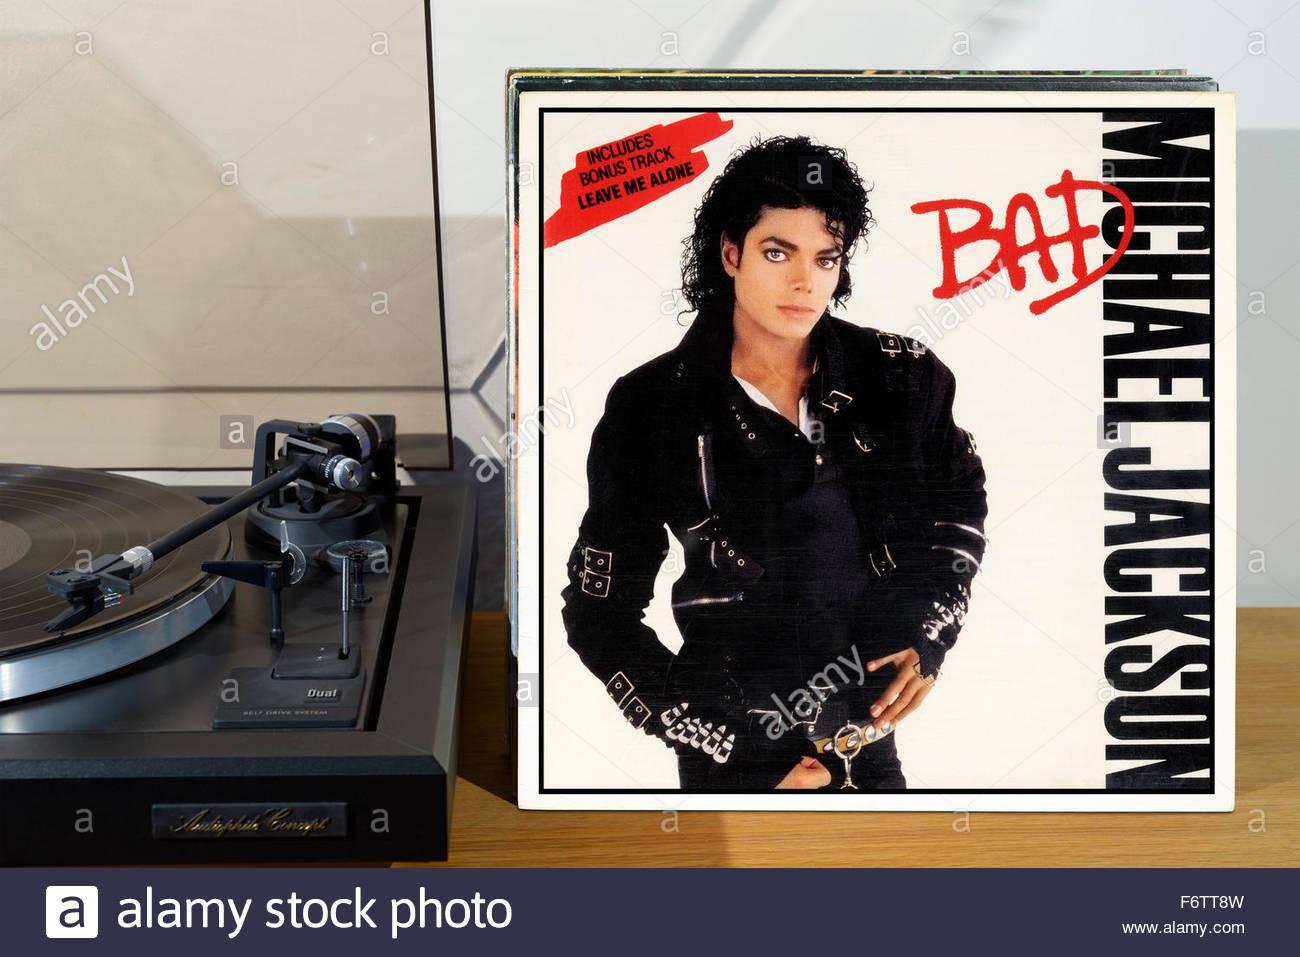 michael jackson bad album stock photos michael jackson bad album